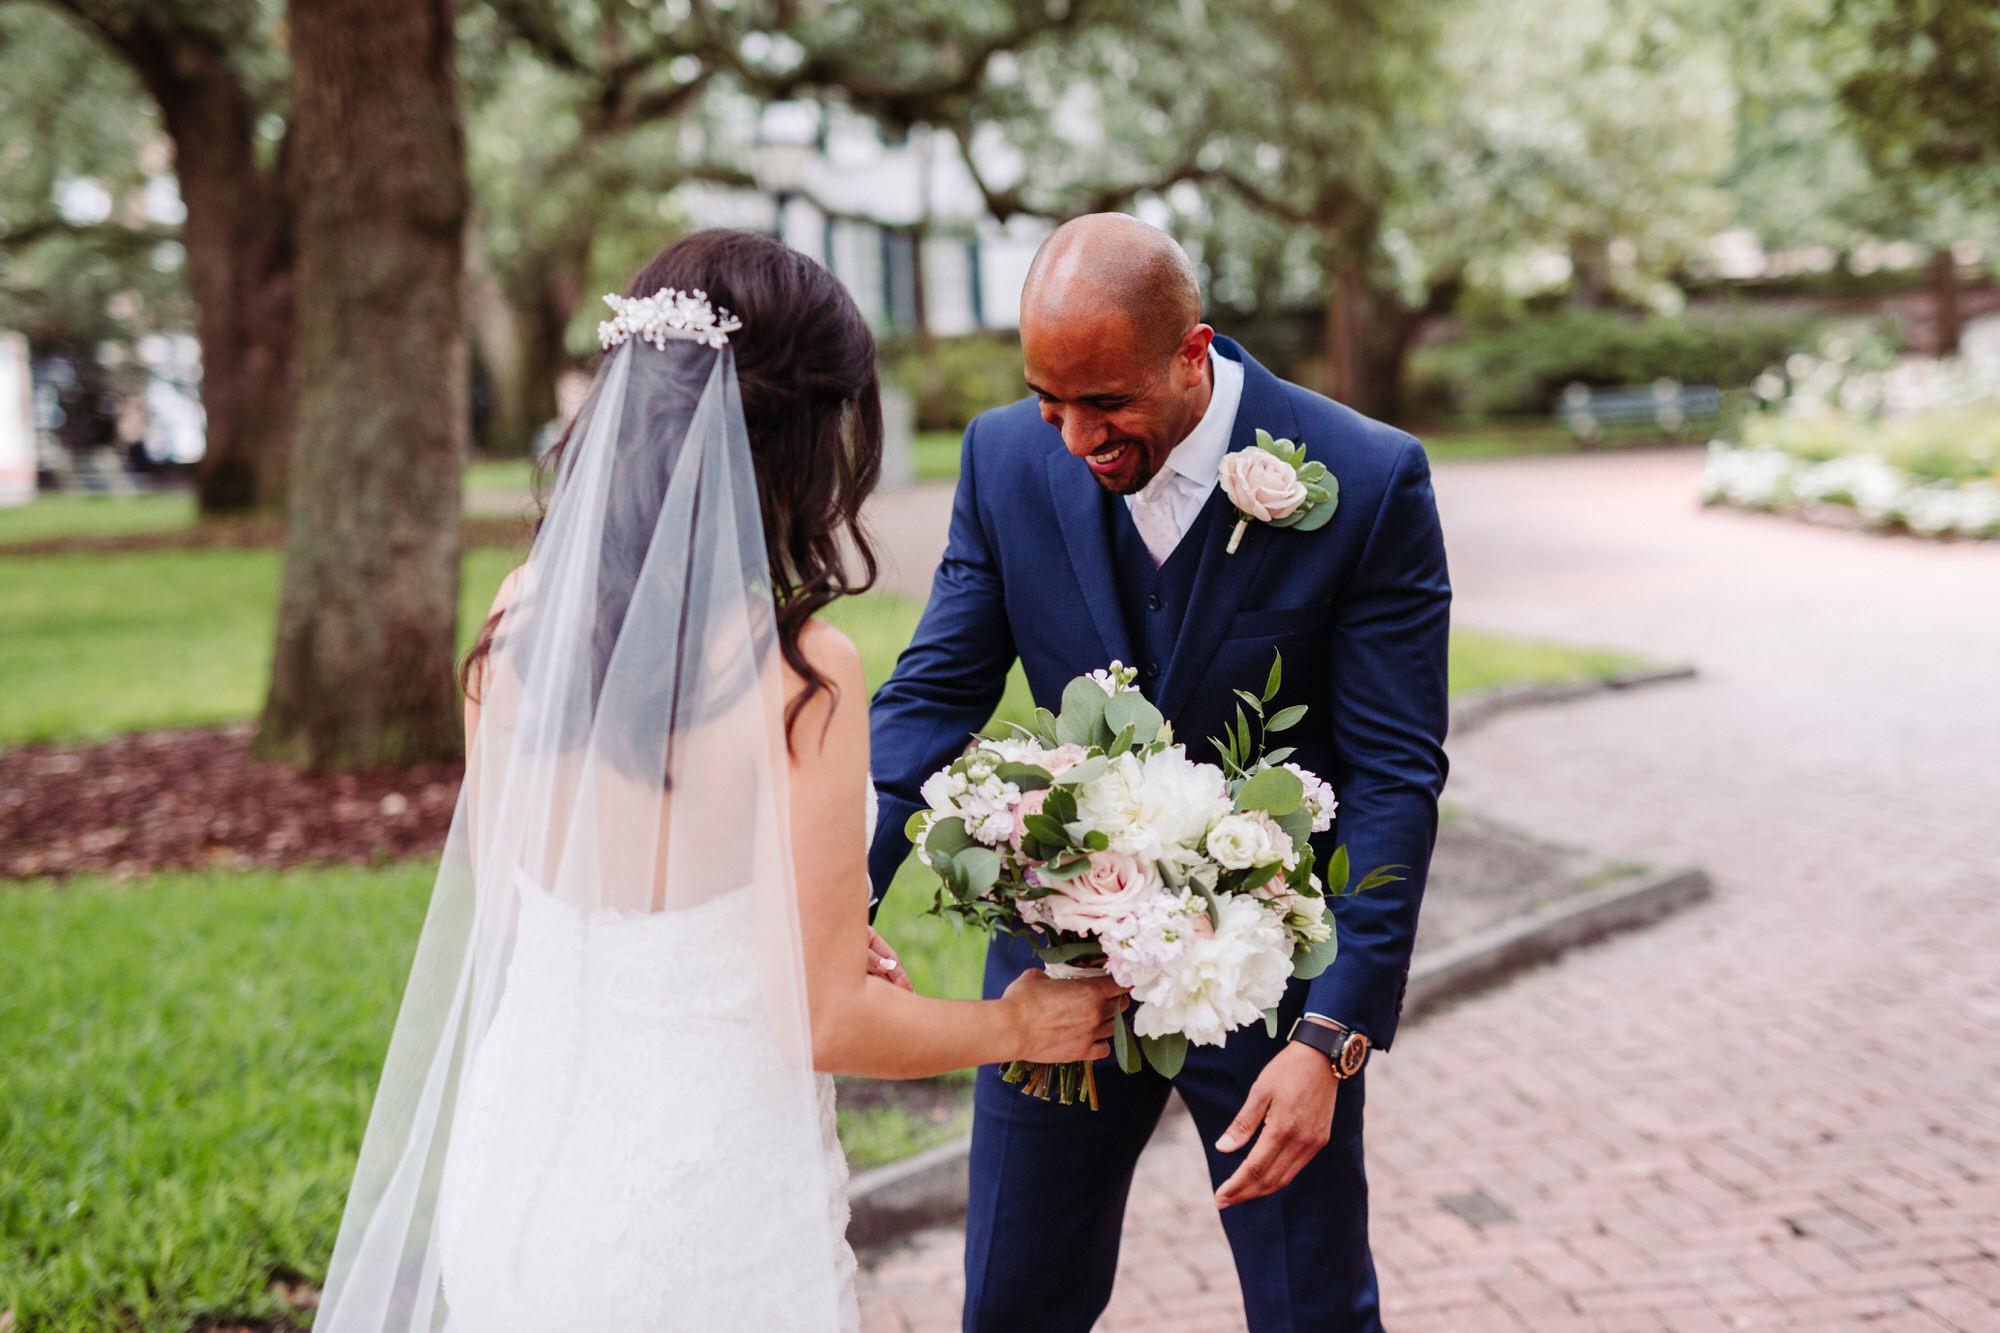 st-lukes-chapel-cannon-green-charleston-wedding-884.JPG